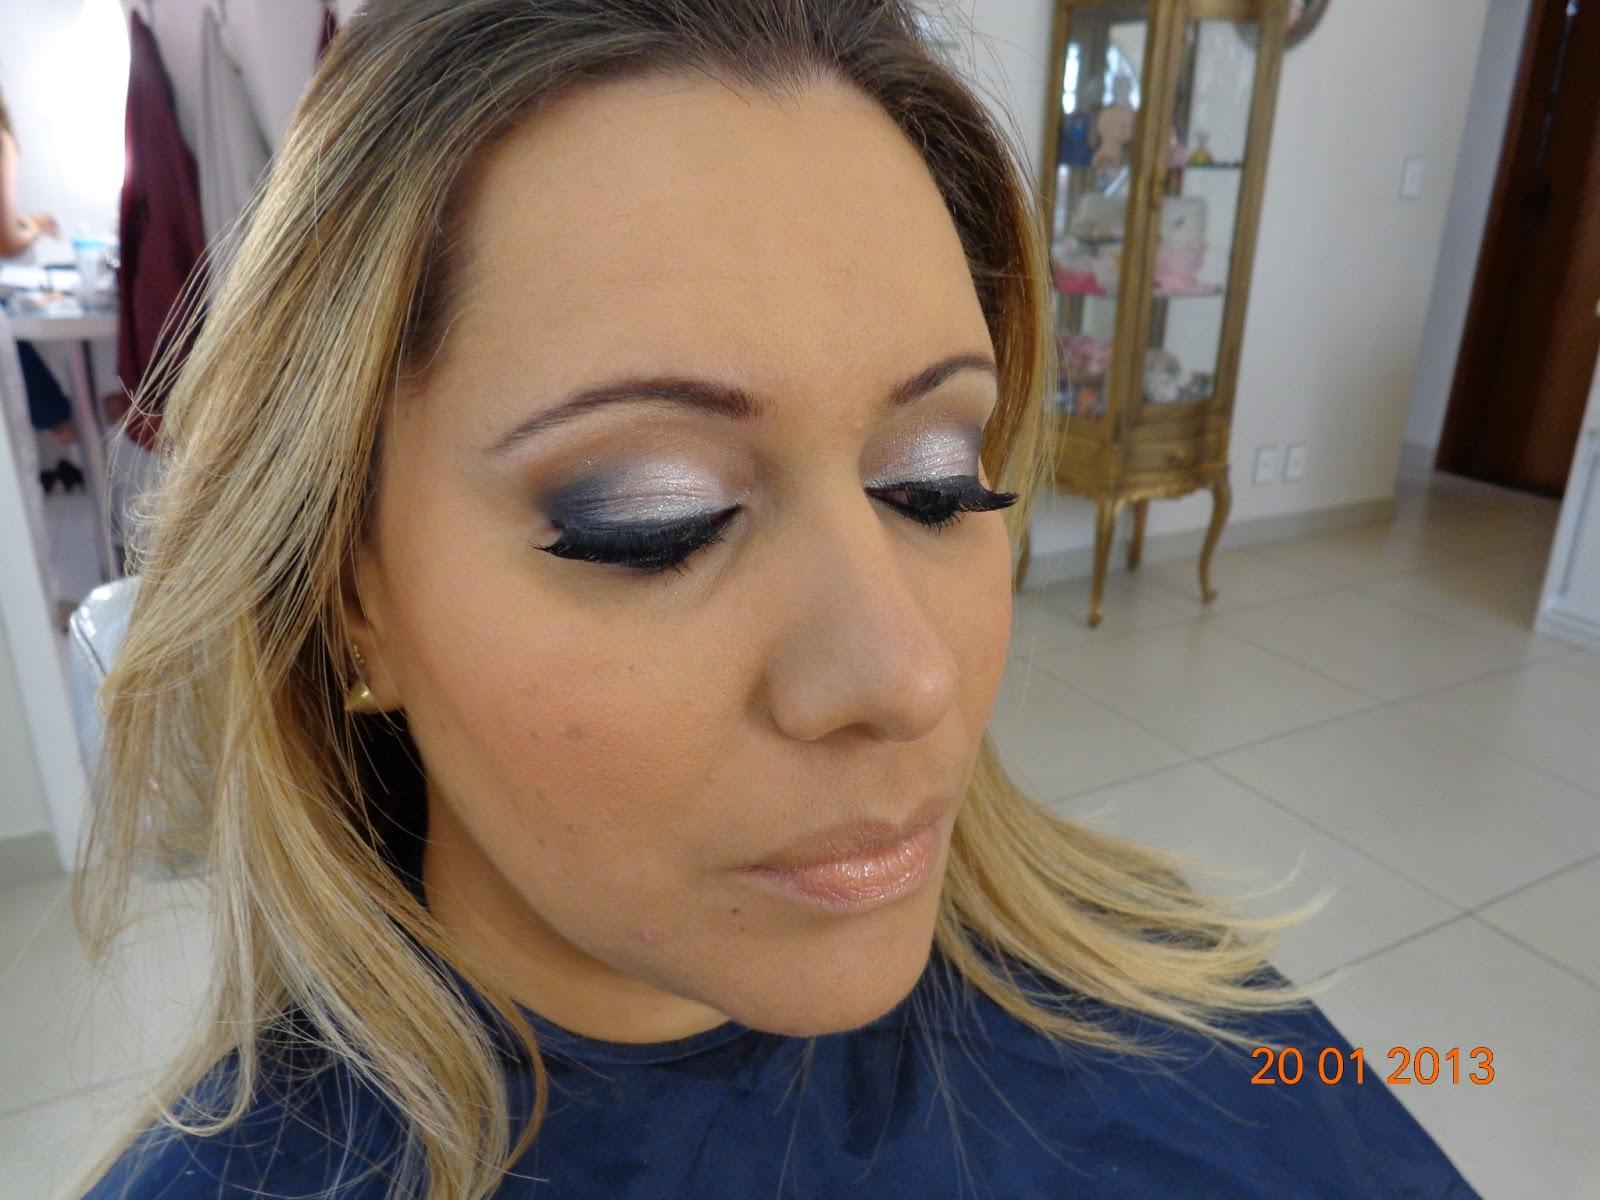 To maquiando! : 01/01/2013 02/01/2013 #293959 1600x1200